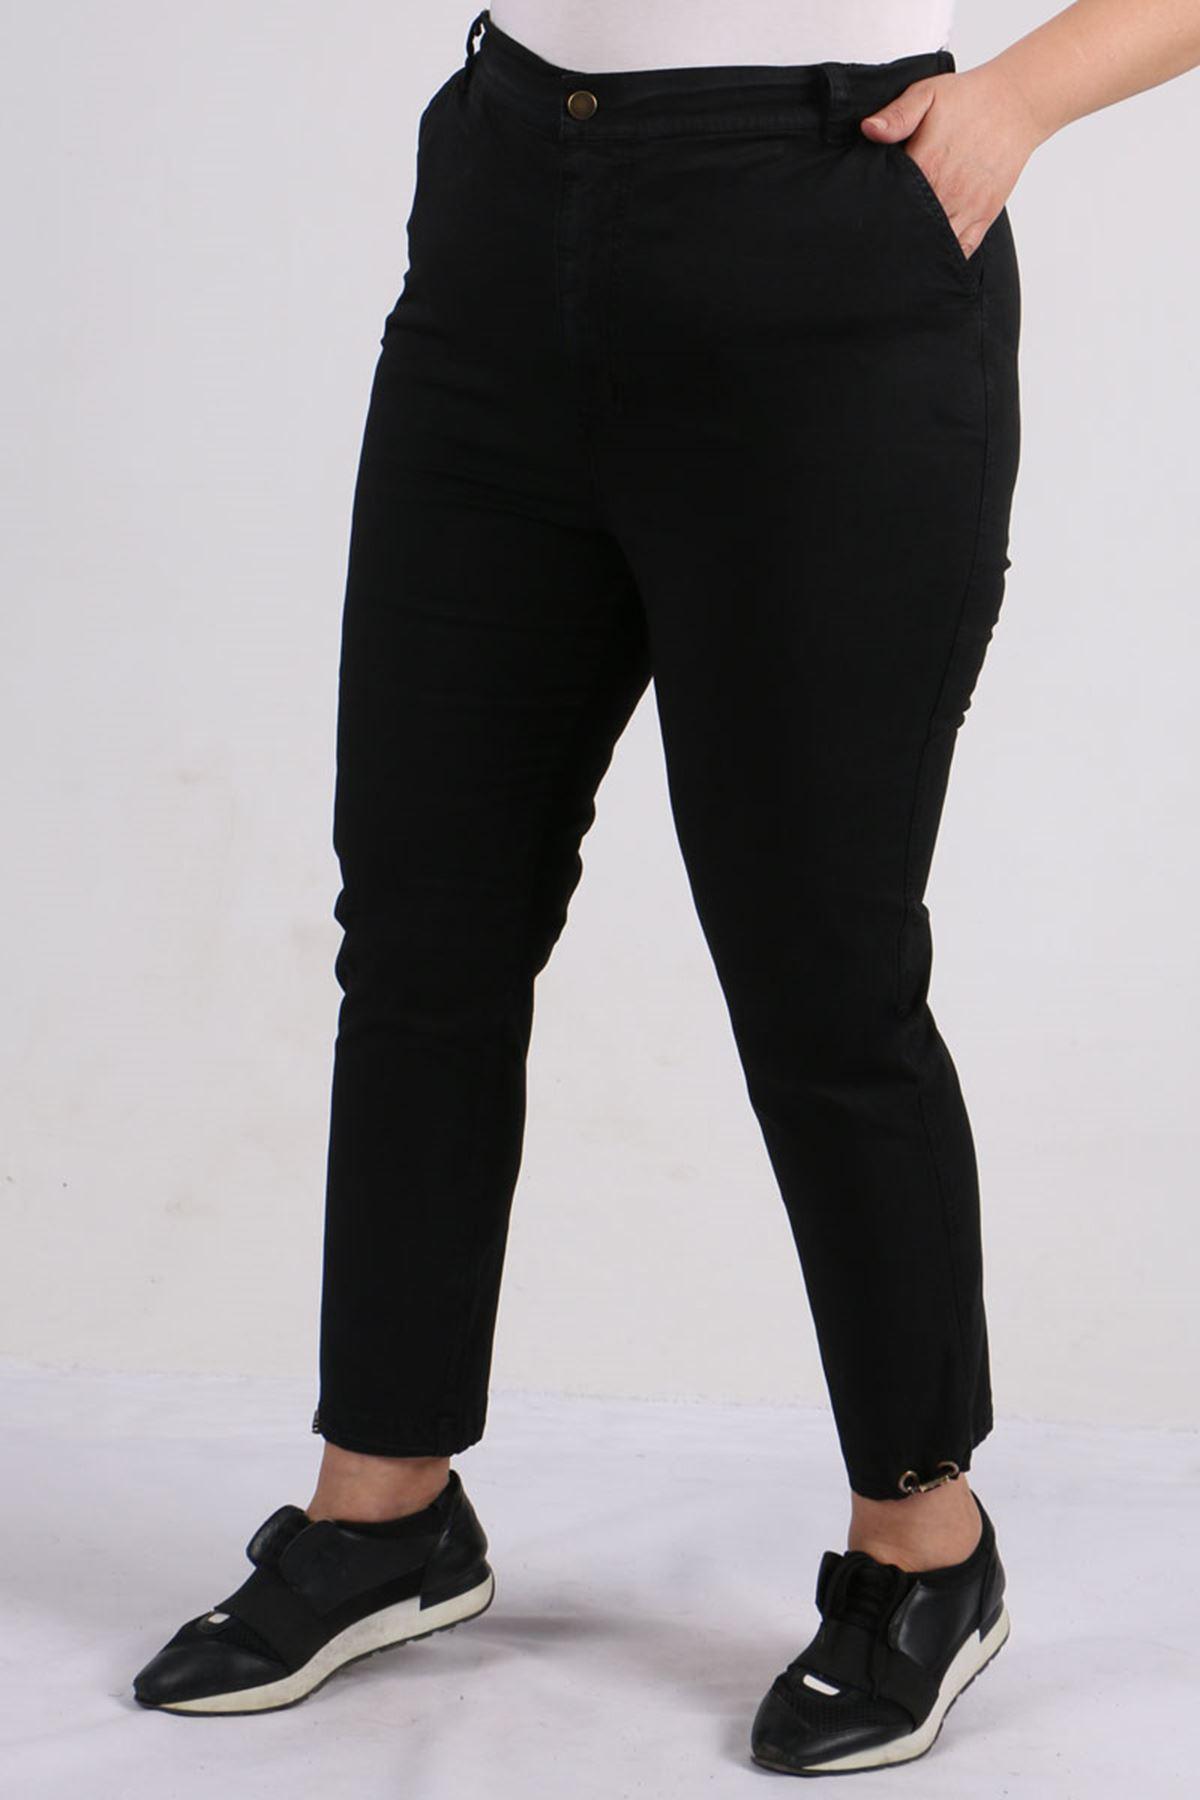 9133 Plus Size Gabardine Pants - Black